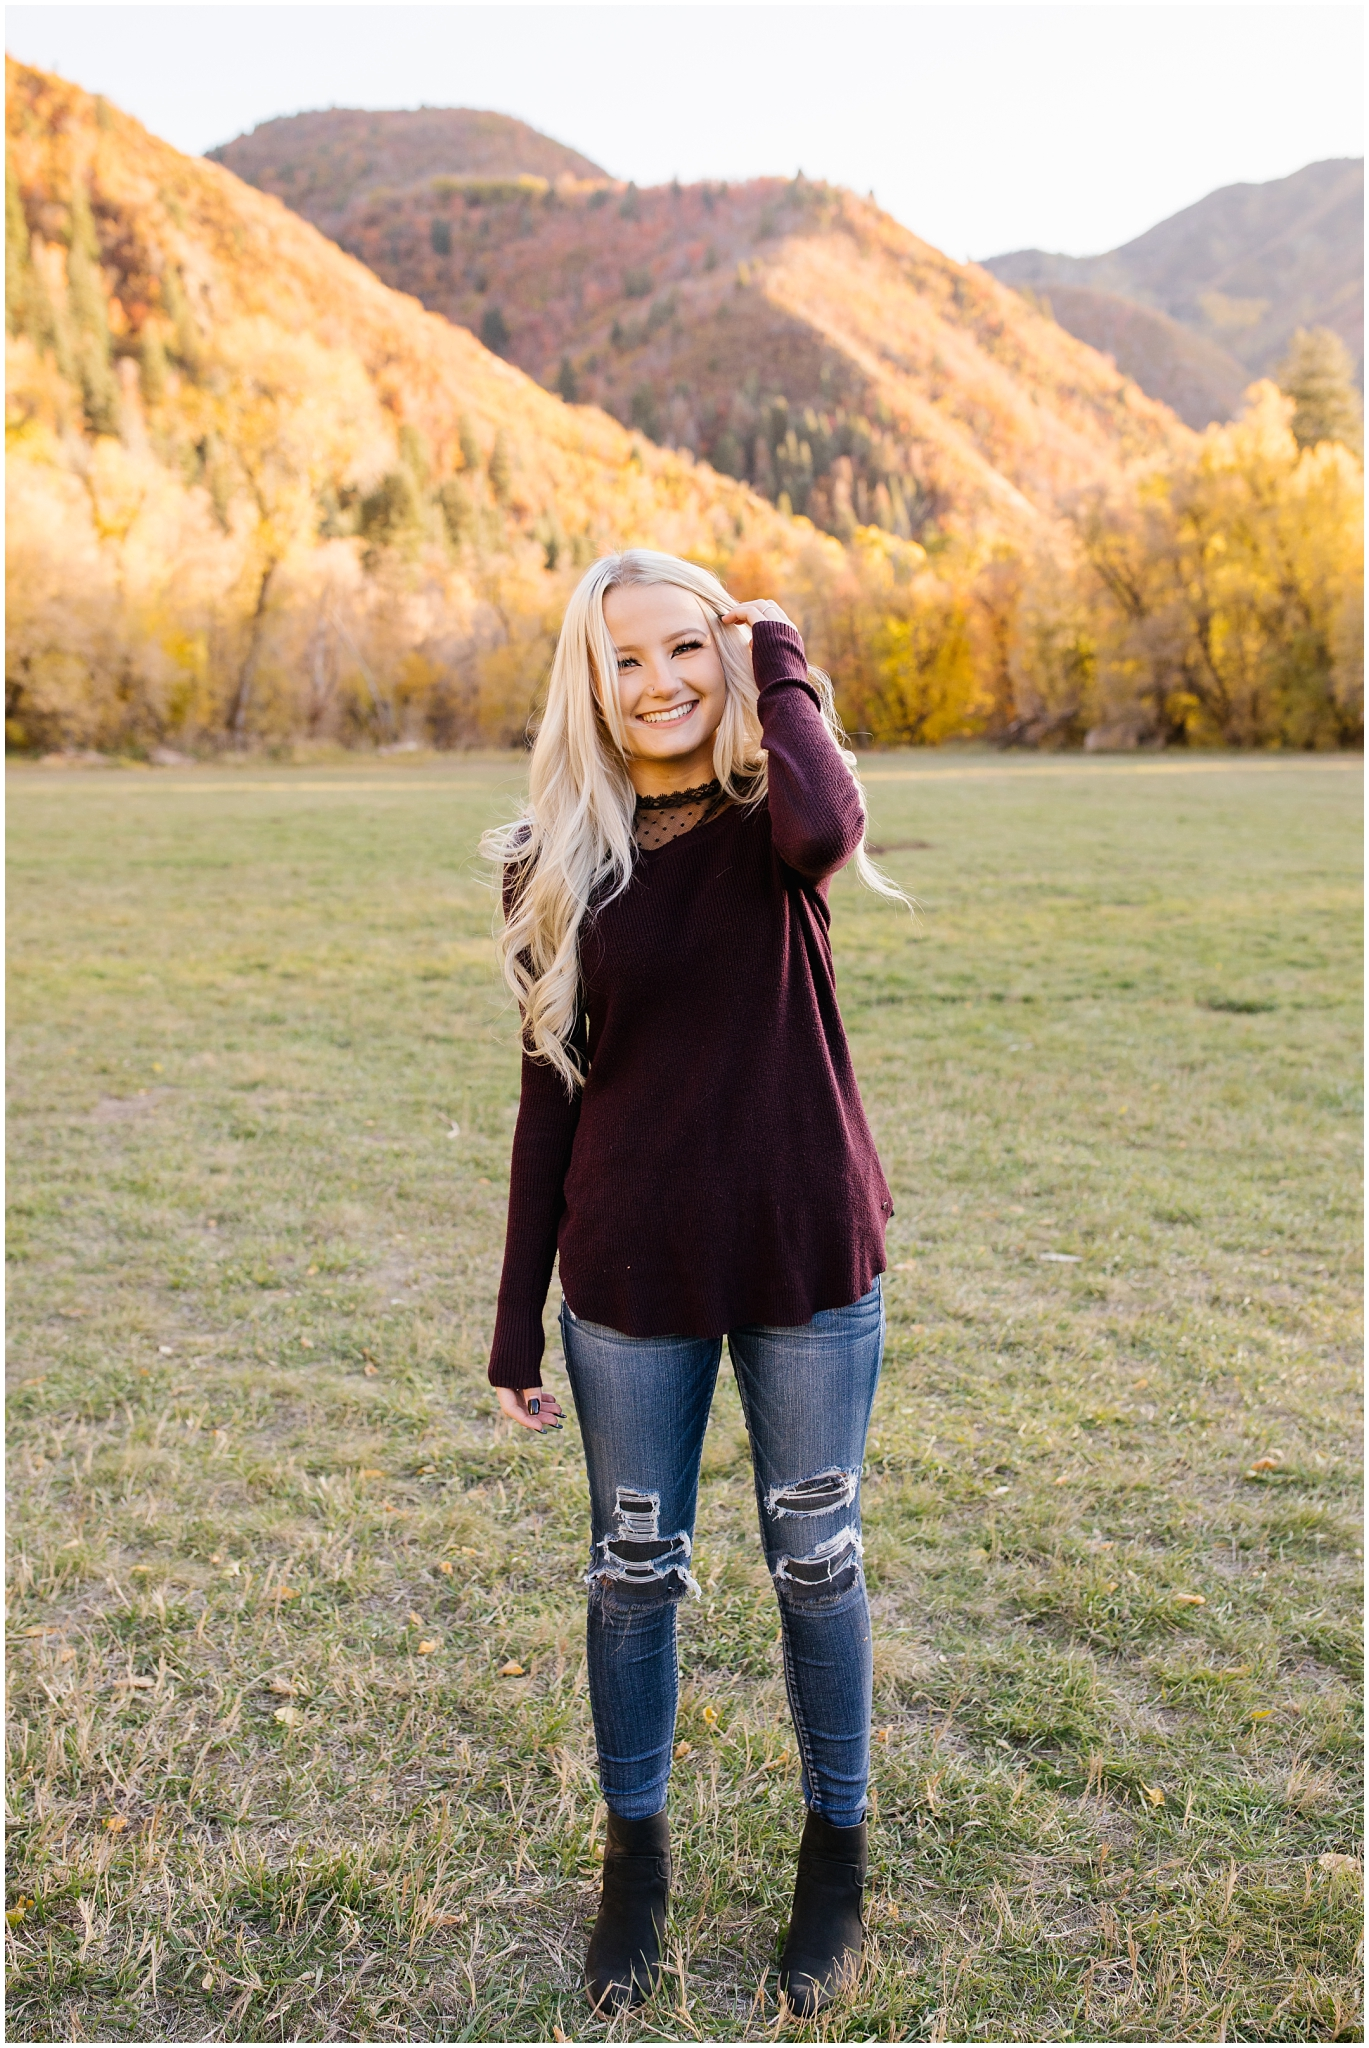 Nielsen--93_Lizzie-B-Imagery-Utah-Family-Photographer-Park-City-Salt-Lake-City-Hobble-Creek-Canyon-Jolleys-Ranch.jpg